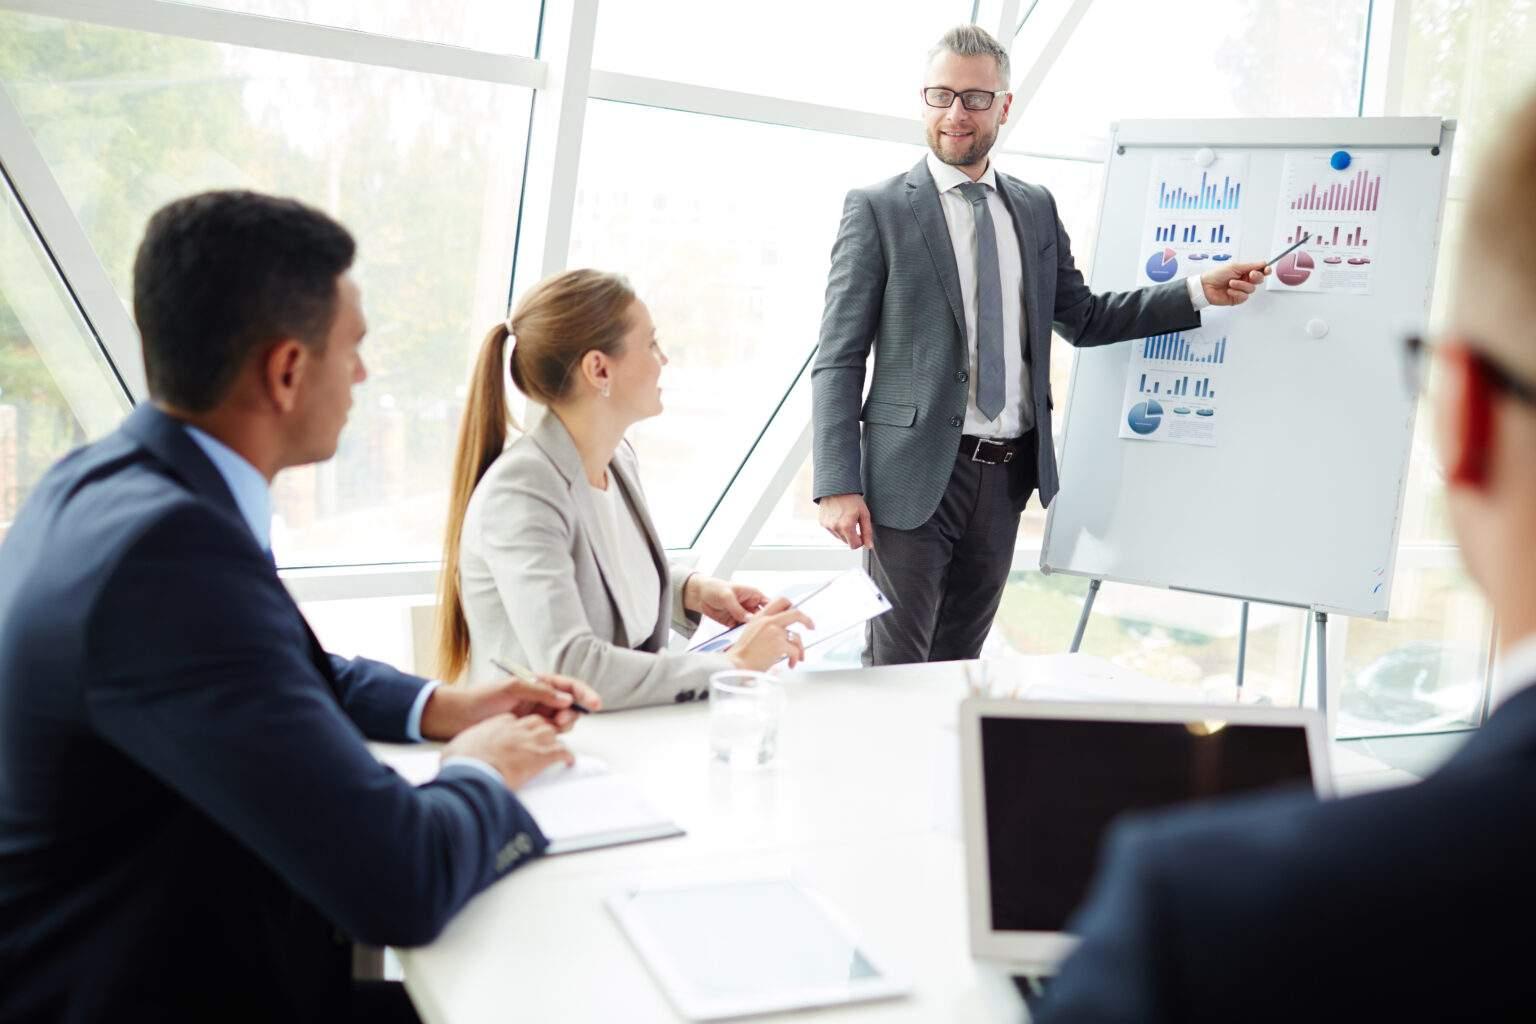 Wealth management training courses